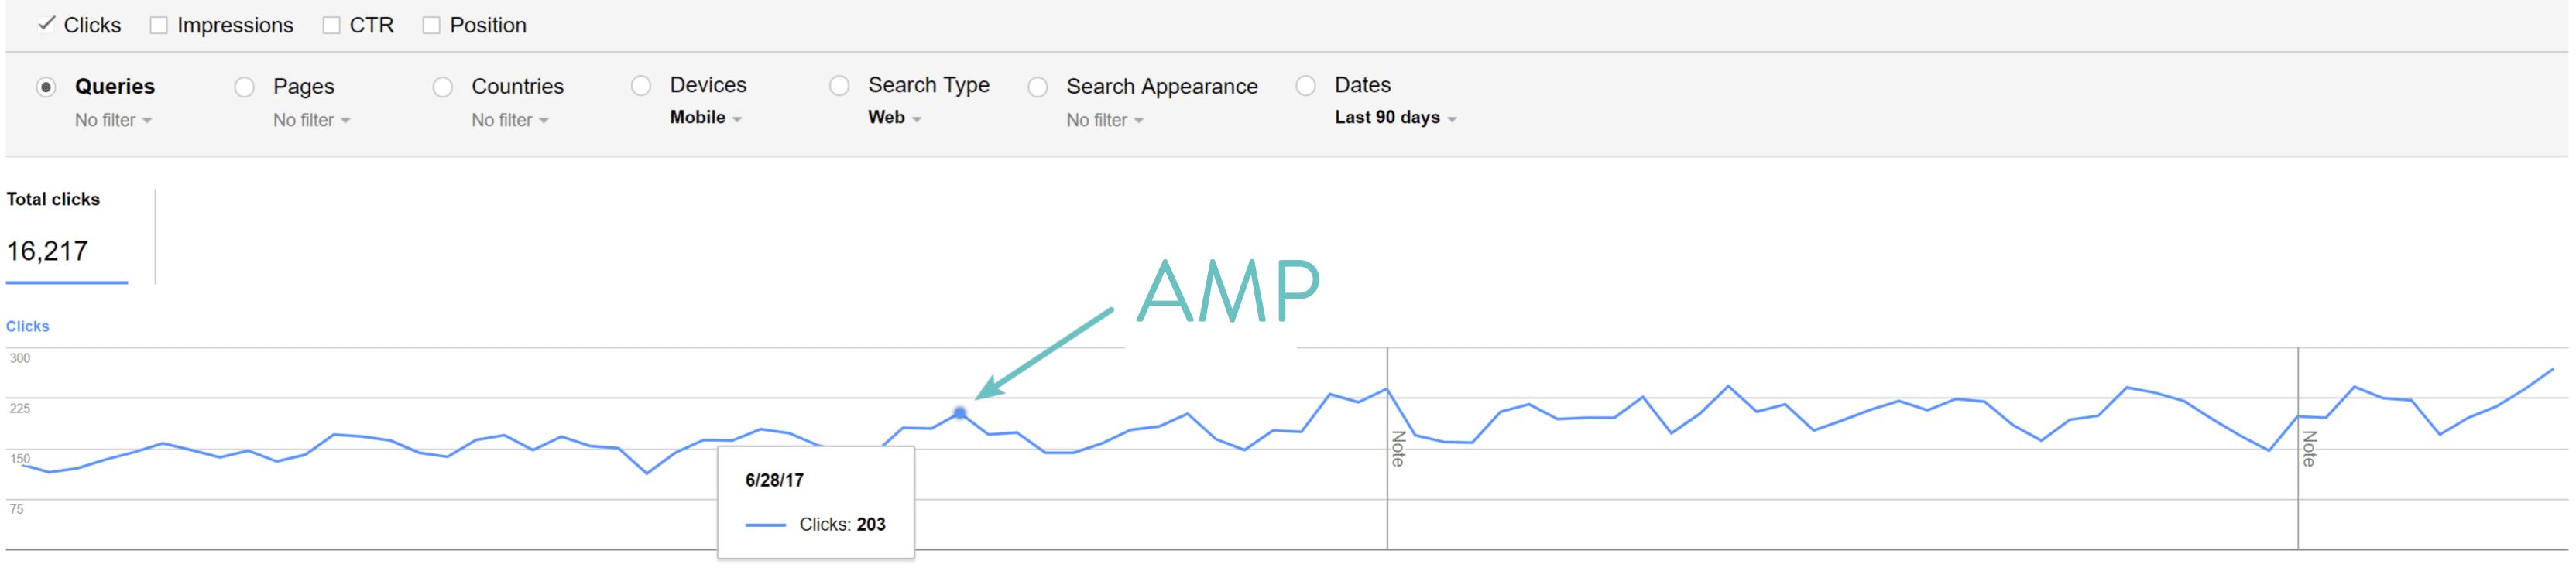 Google AMP clicks